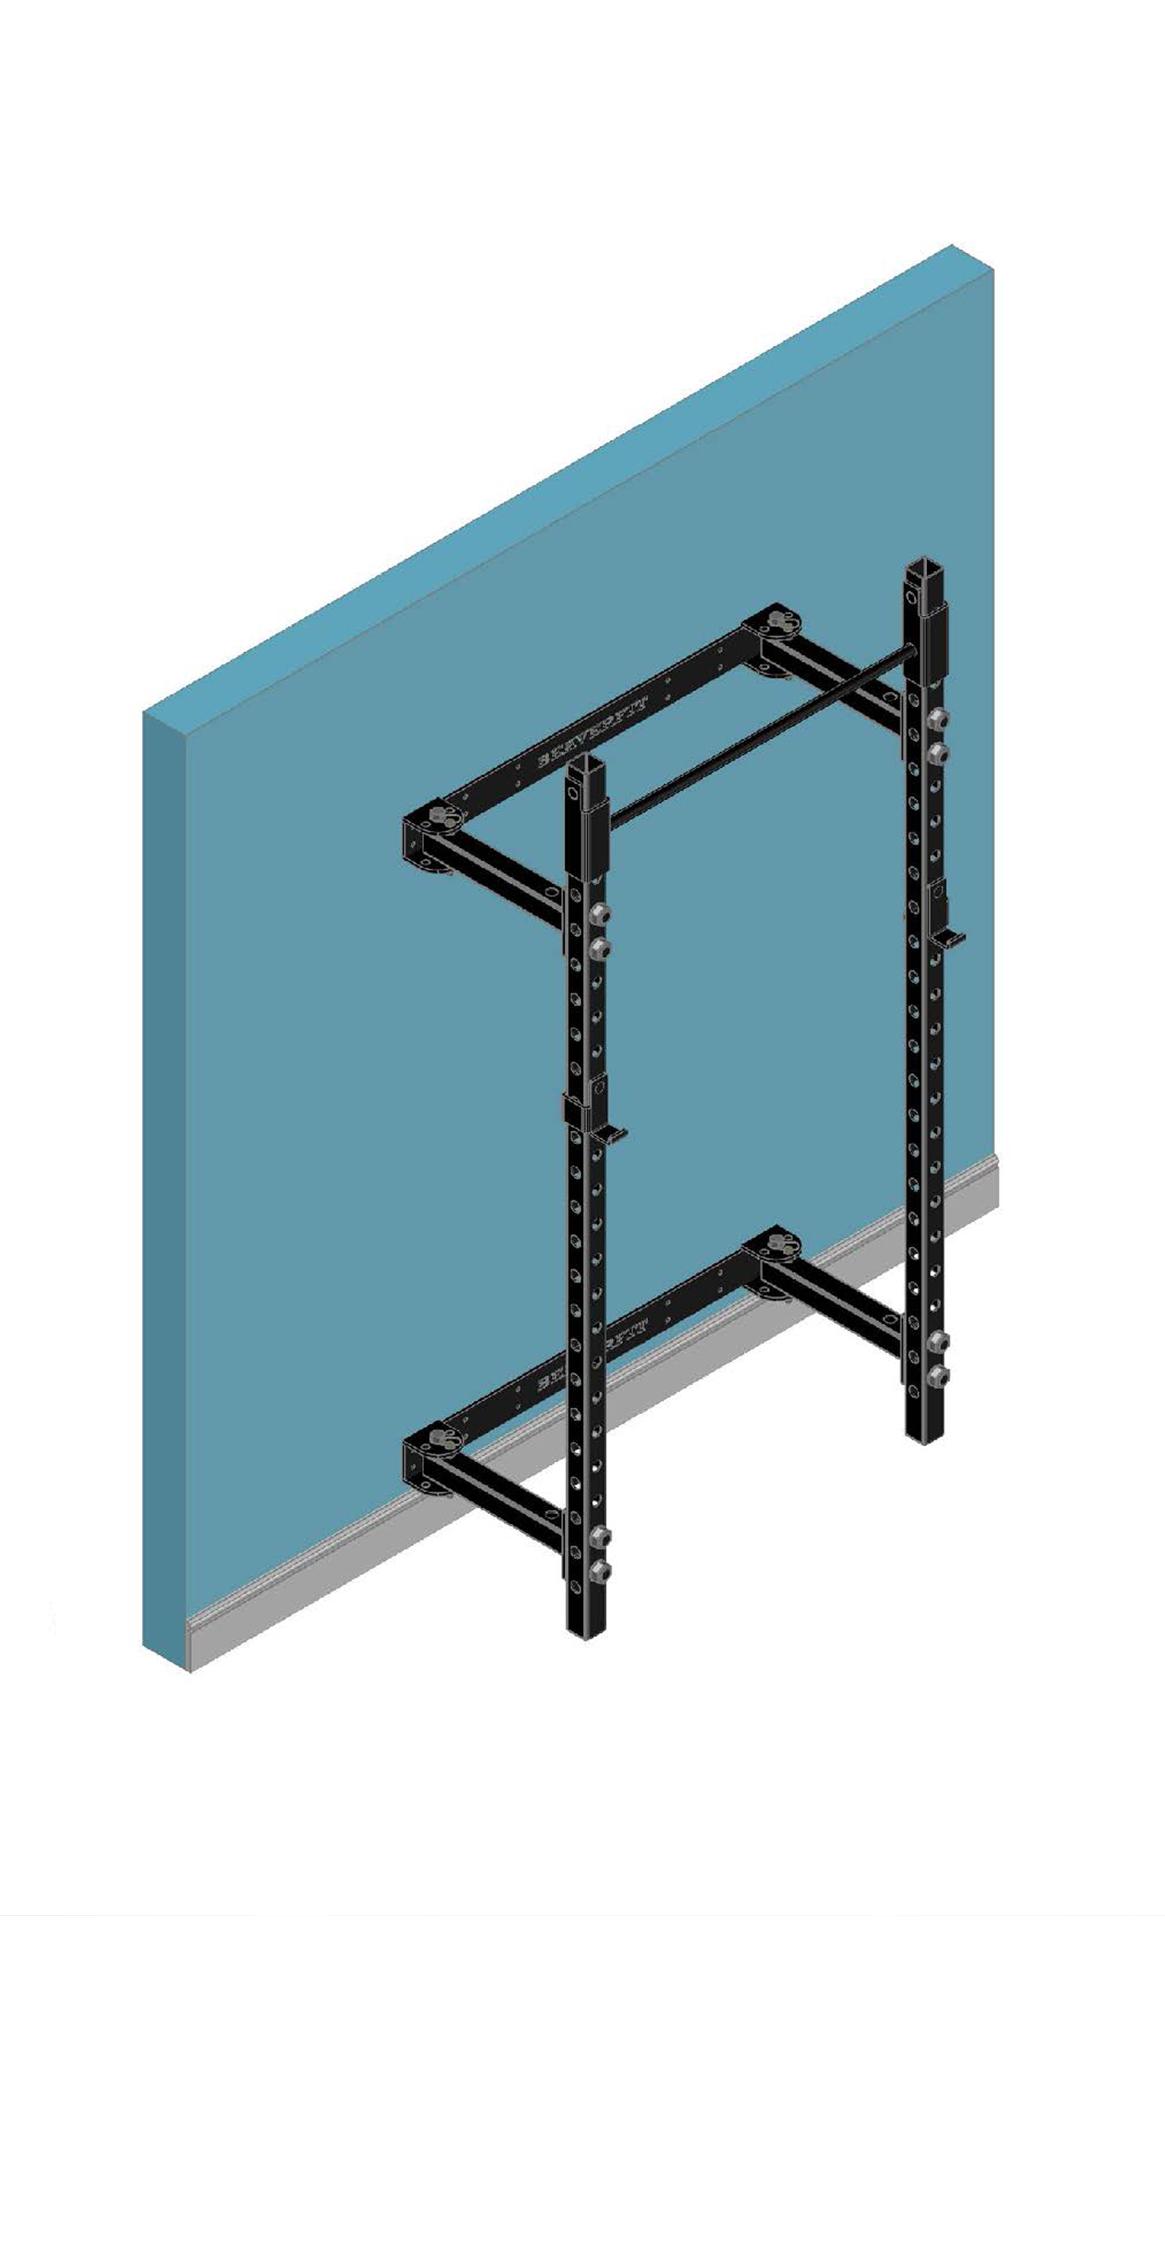 Wall-Mounted Rack Main Image